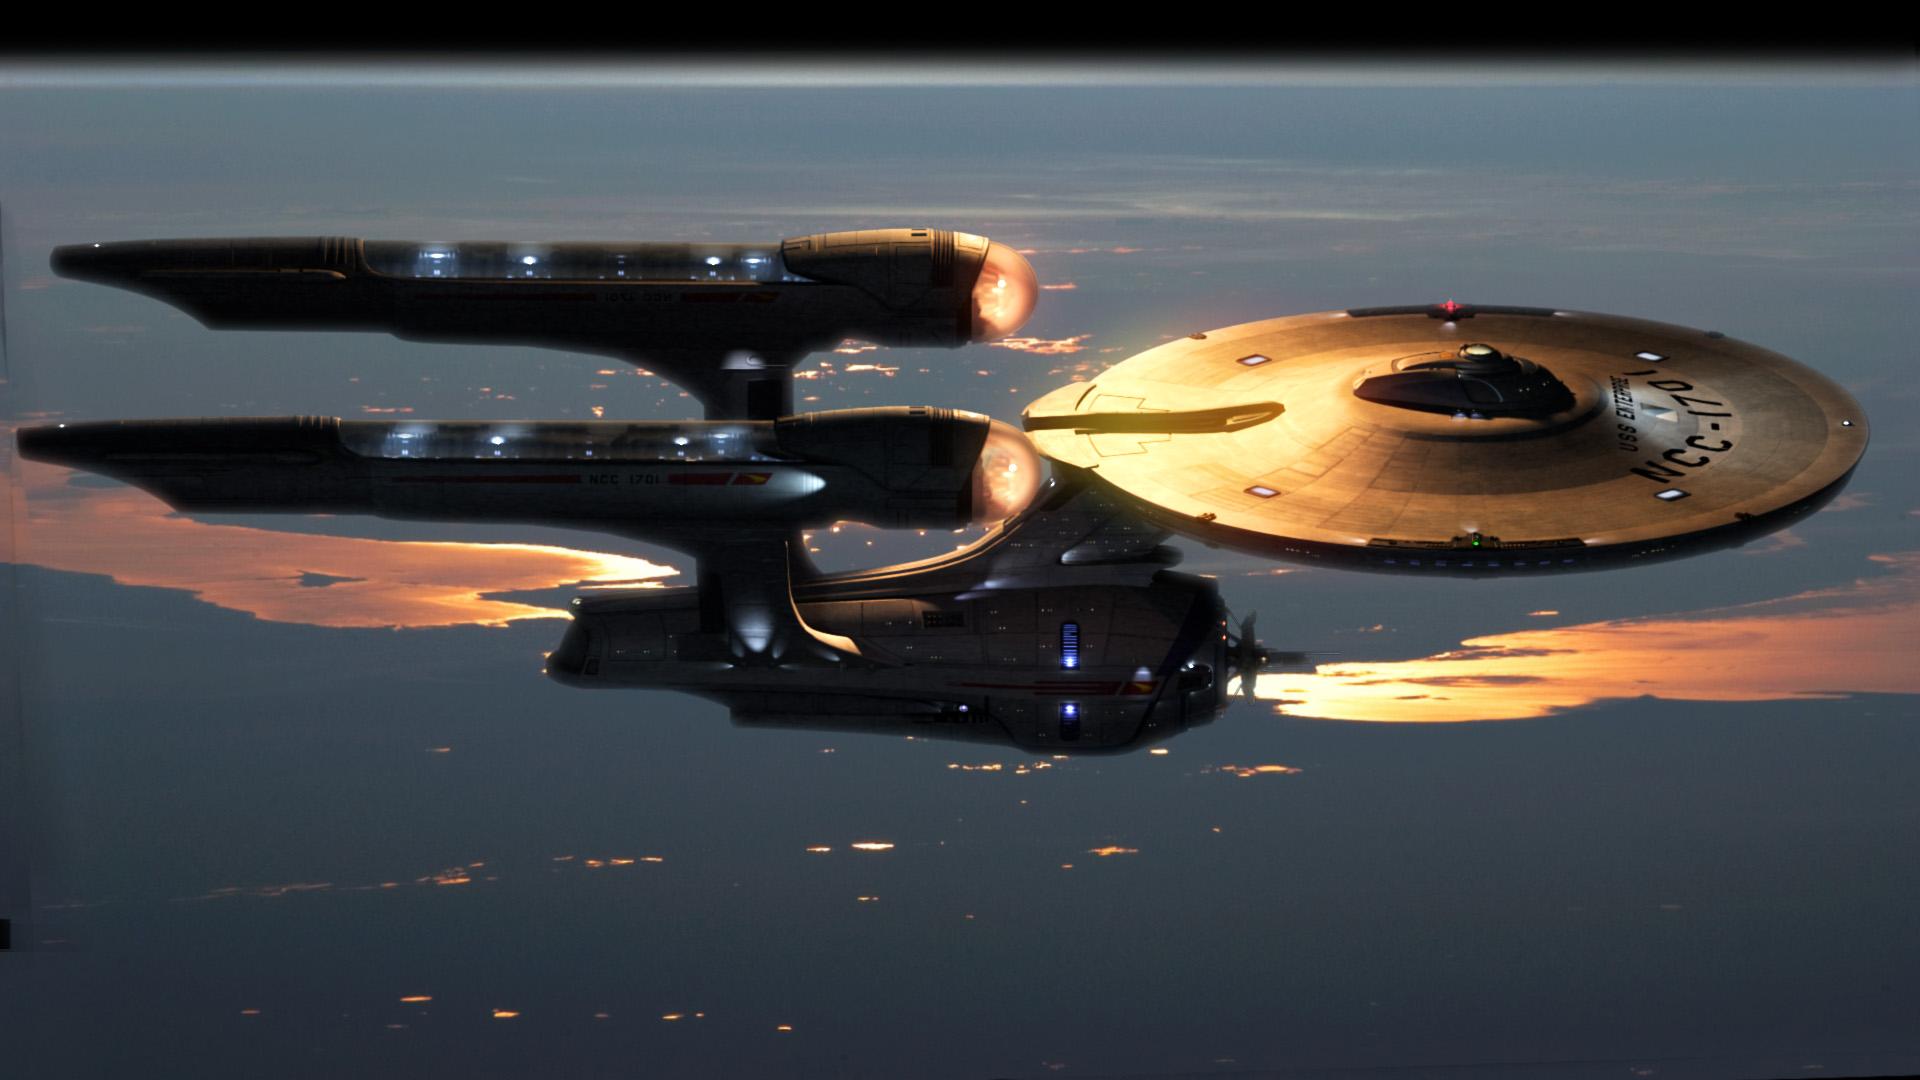 My Starship Enterprise By GabeKoerner